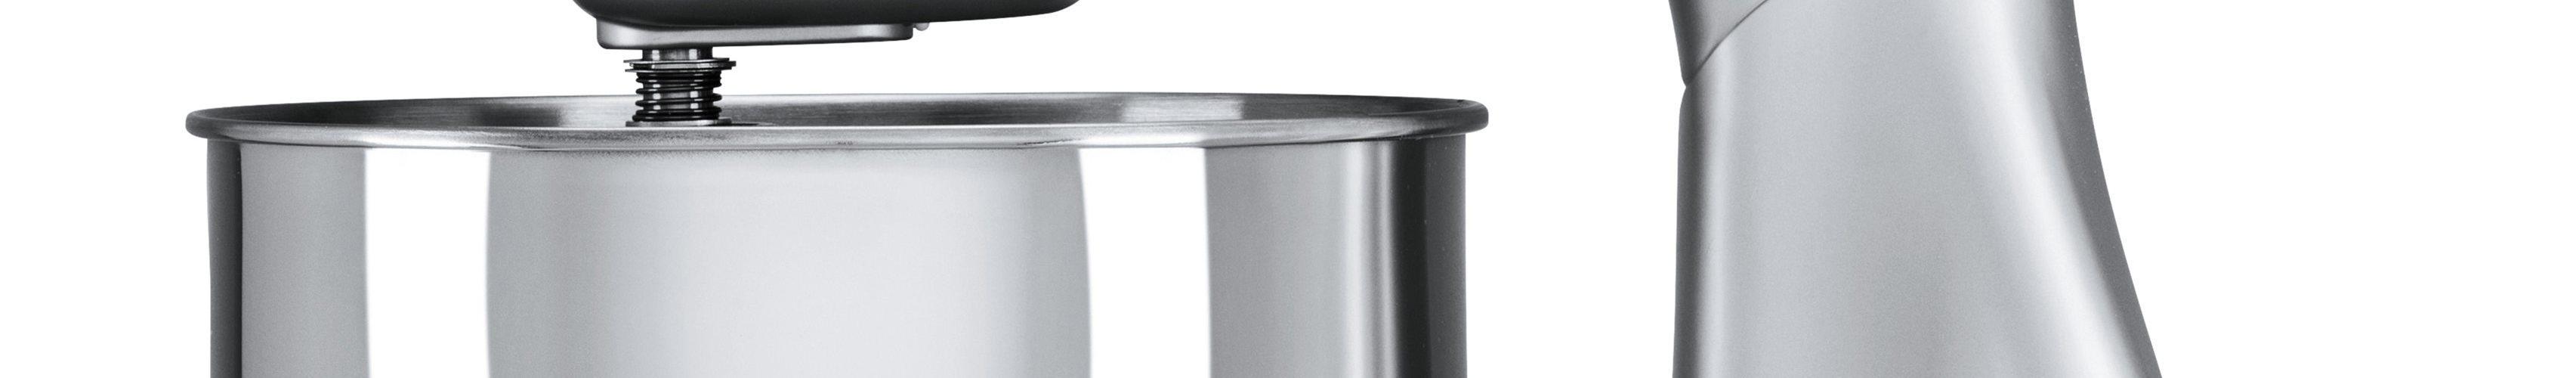 Smeg SMF01BLEU keukenmixer